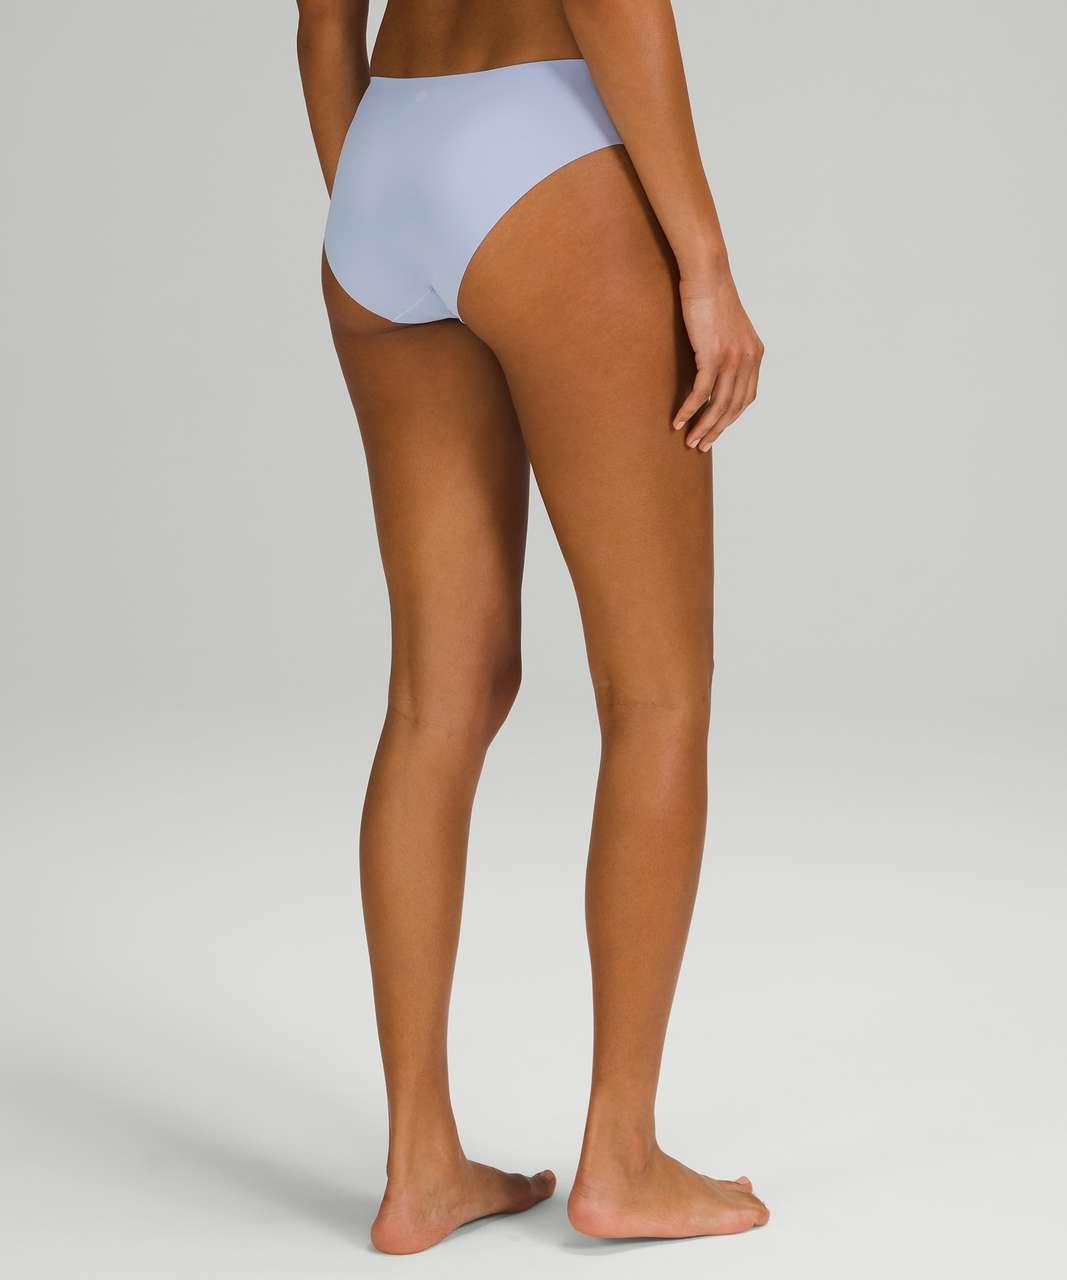 Lululemon InvisiWear Mid Rise Bikini Underwear - Blue Linen